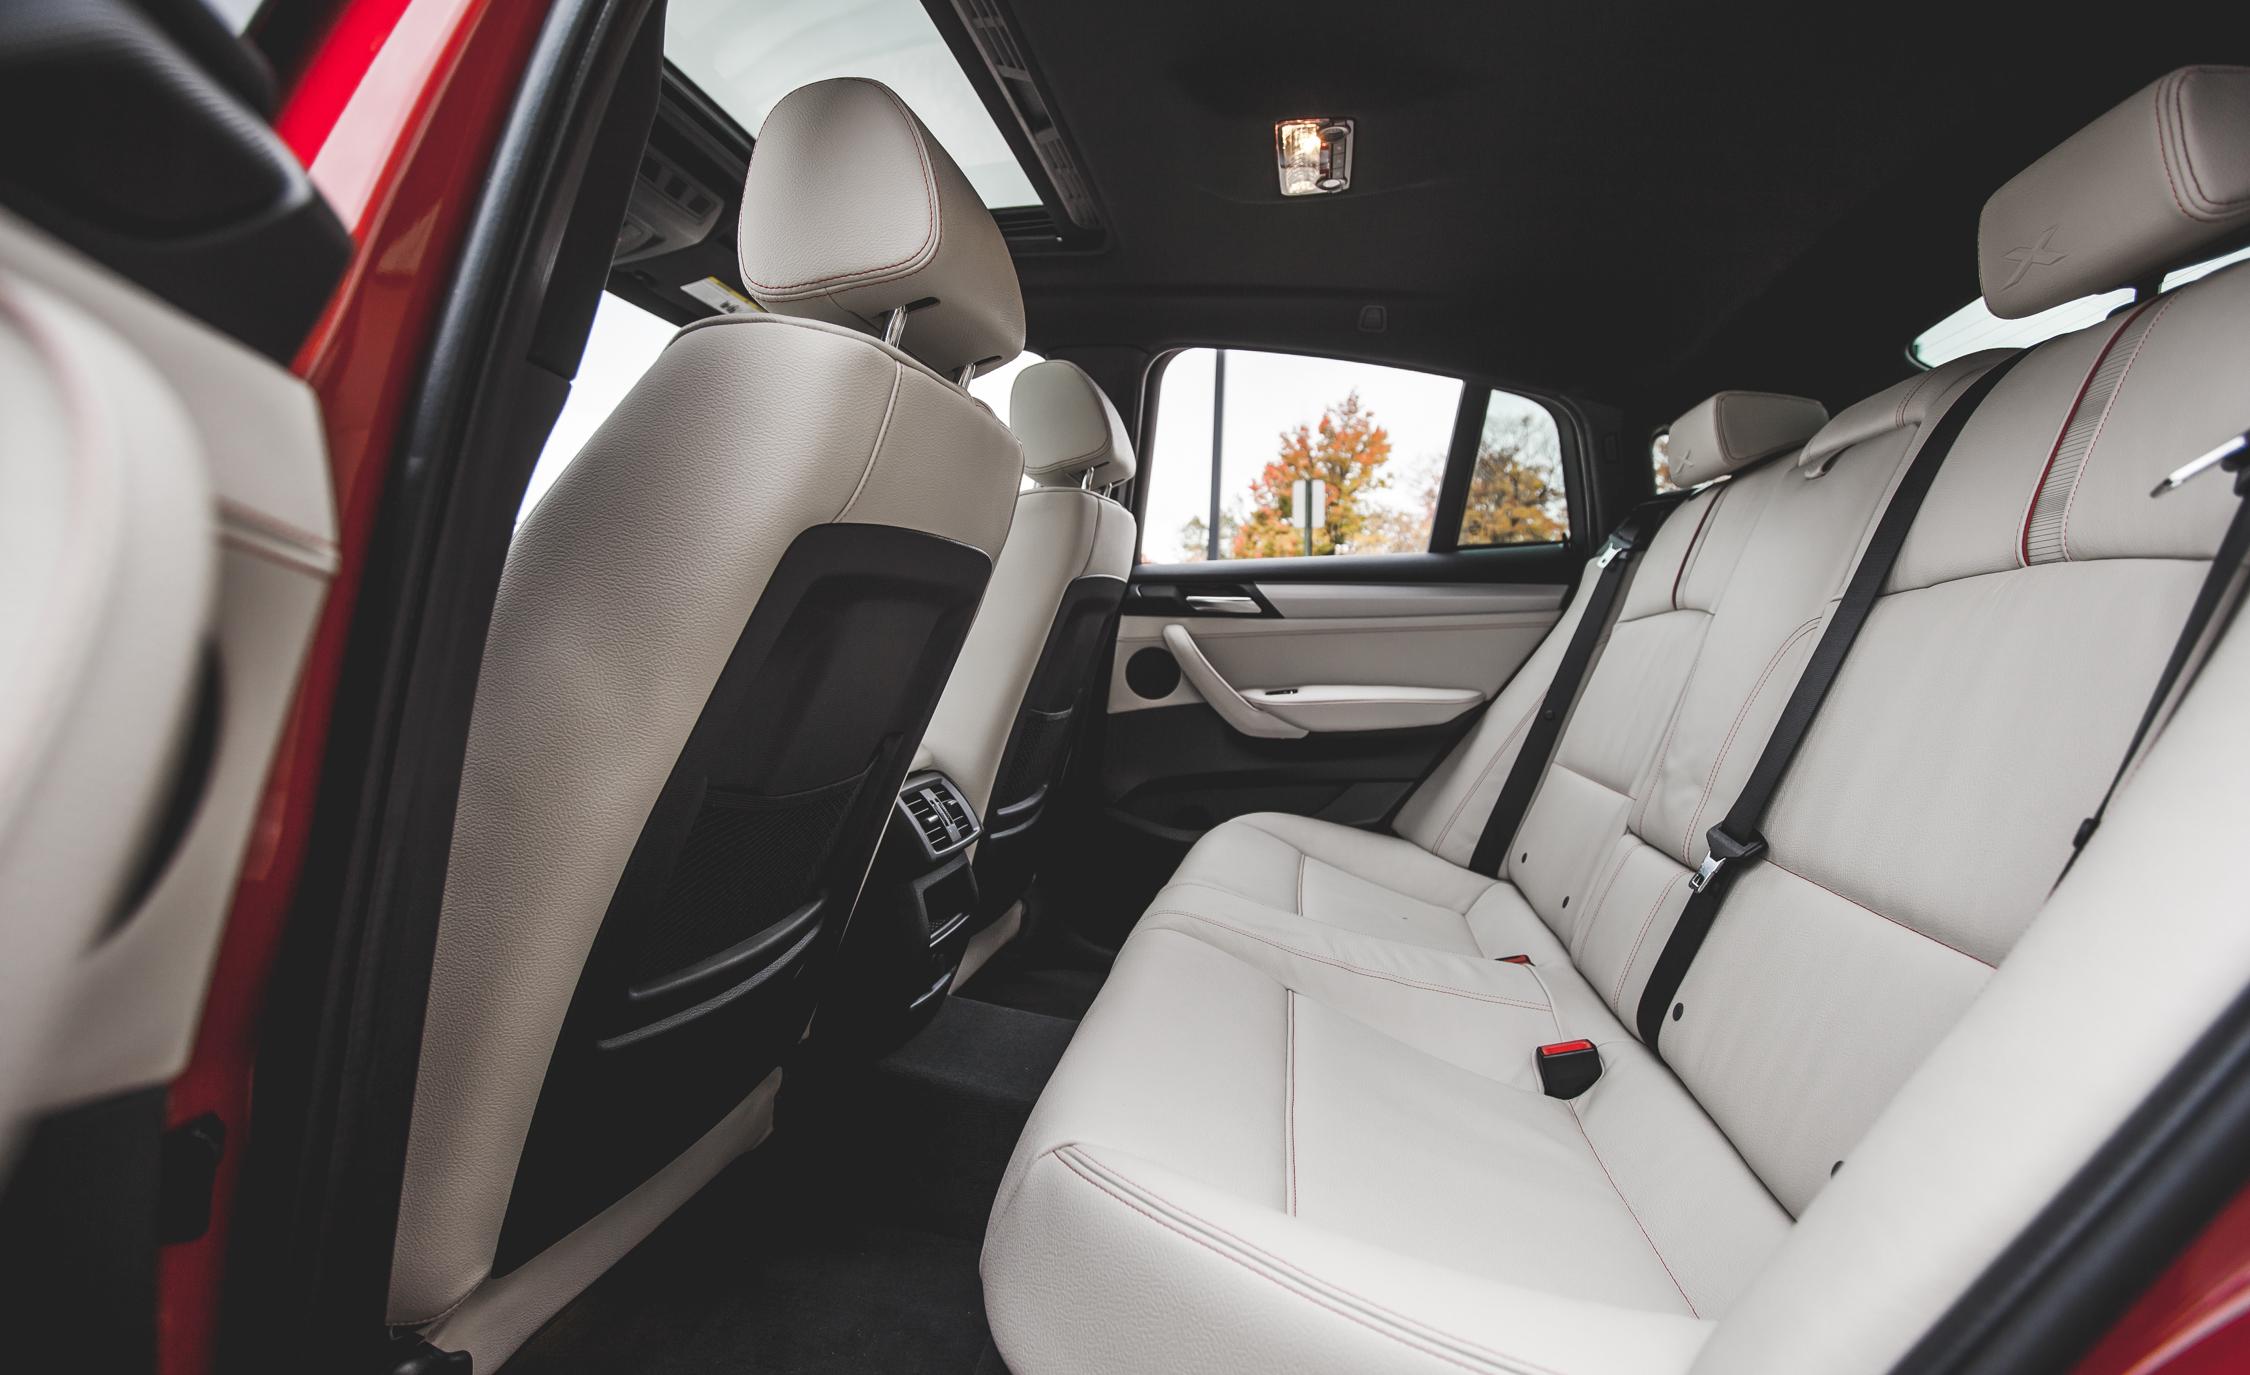 2015 BMW X4 xDrive28i Interior Seats Rear